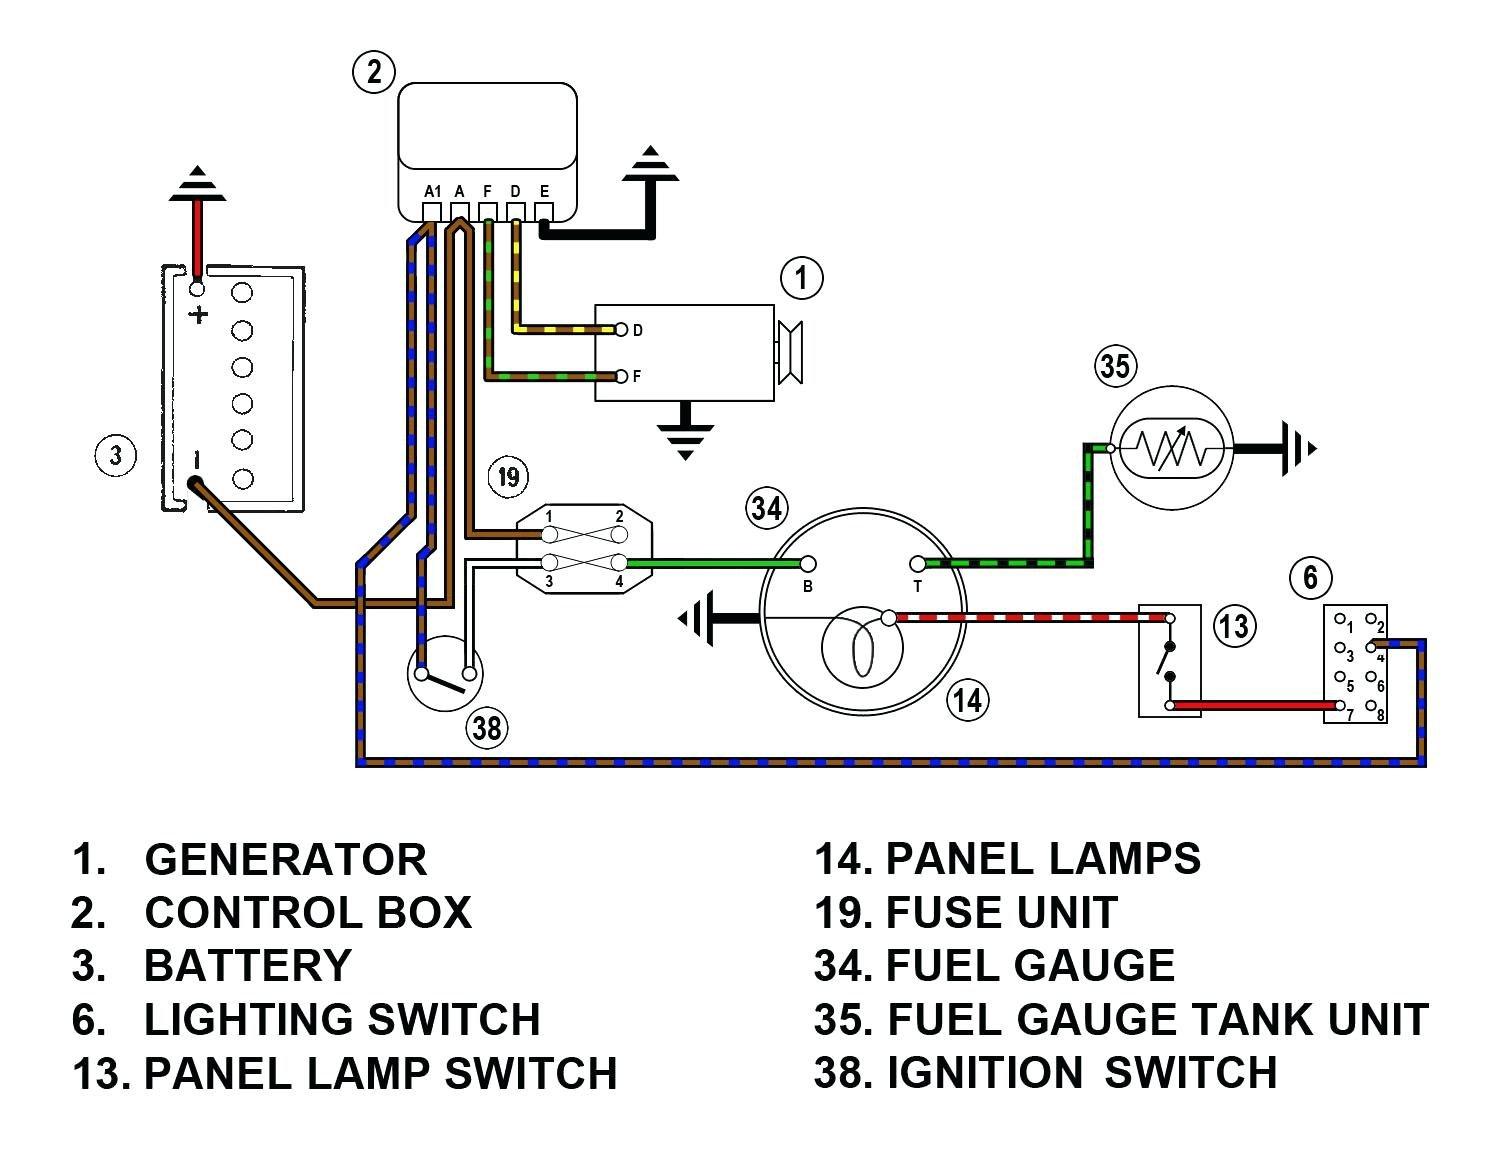 trailer junction box wiring diagram Download-Junction Box Wiring Diagram Awesome Pj Trailer Junction Box Wiring Diagram Great Brake Light Cars 14-q